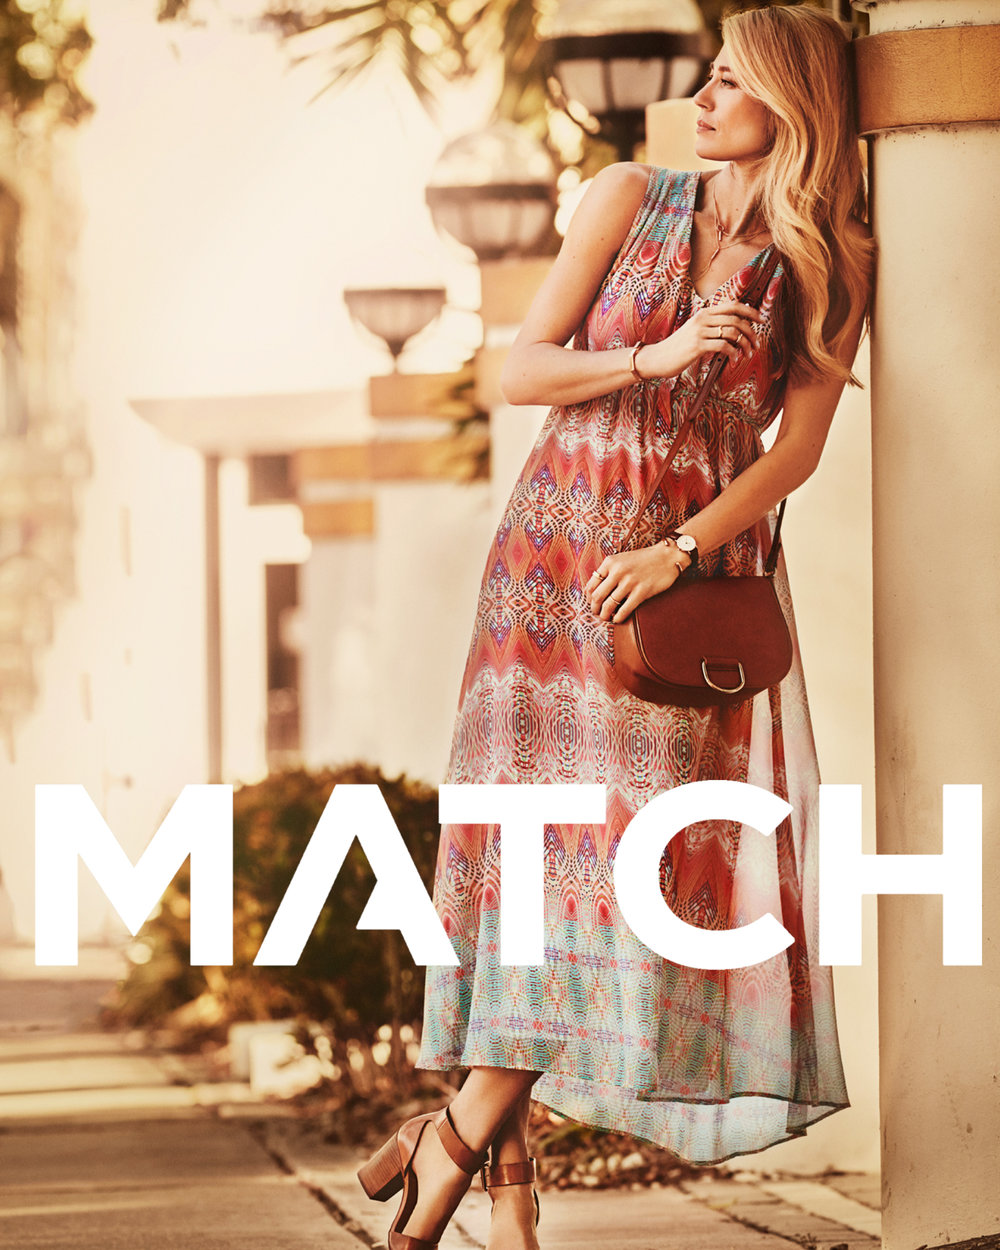 match3.jpg